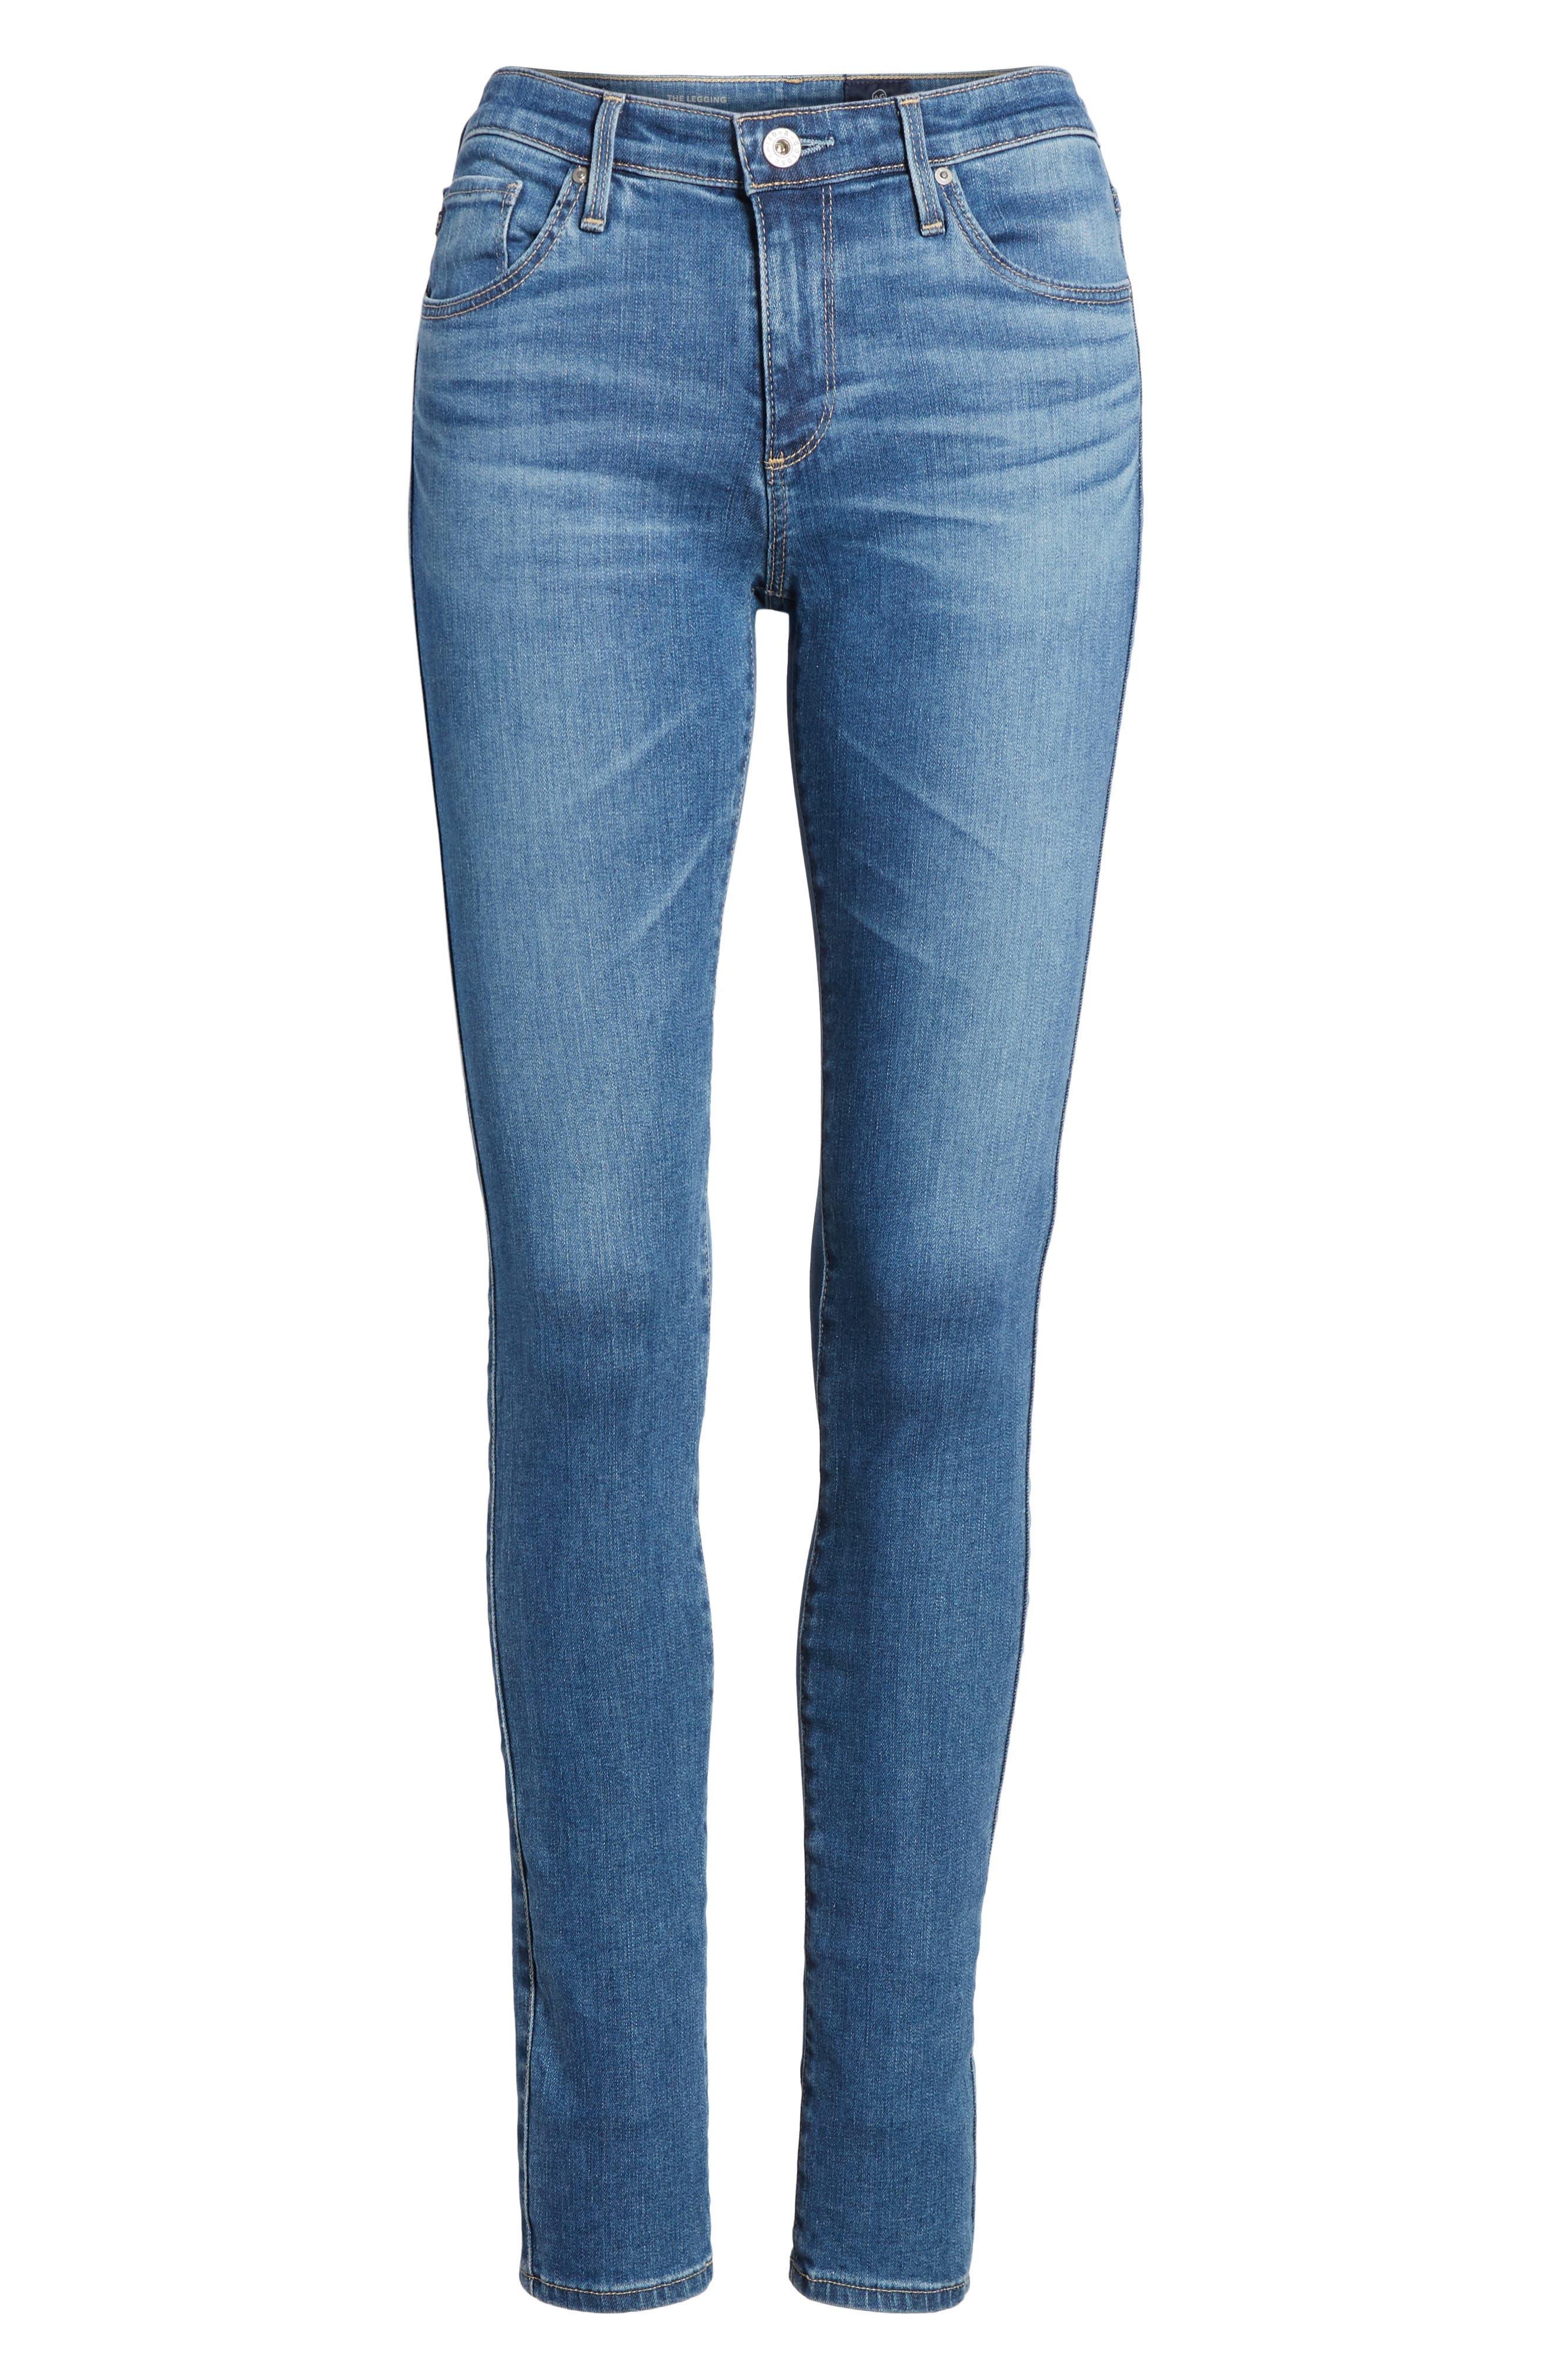 'The Legging' Super Skinny Jeans,                             Alternate thumbnail 56, color,